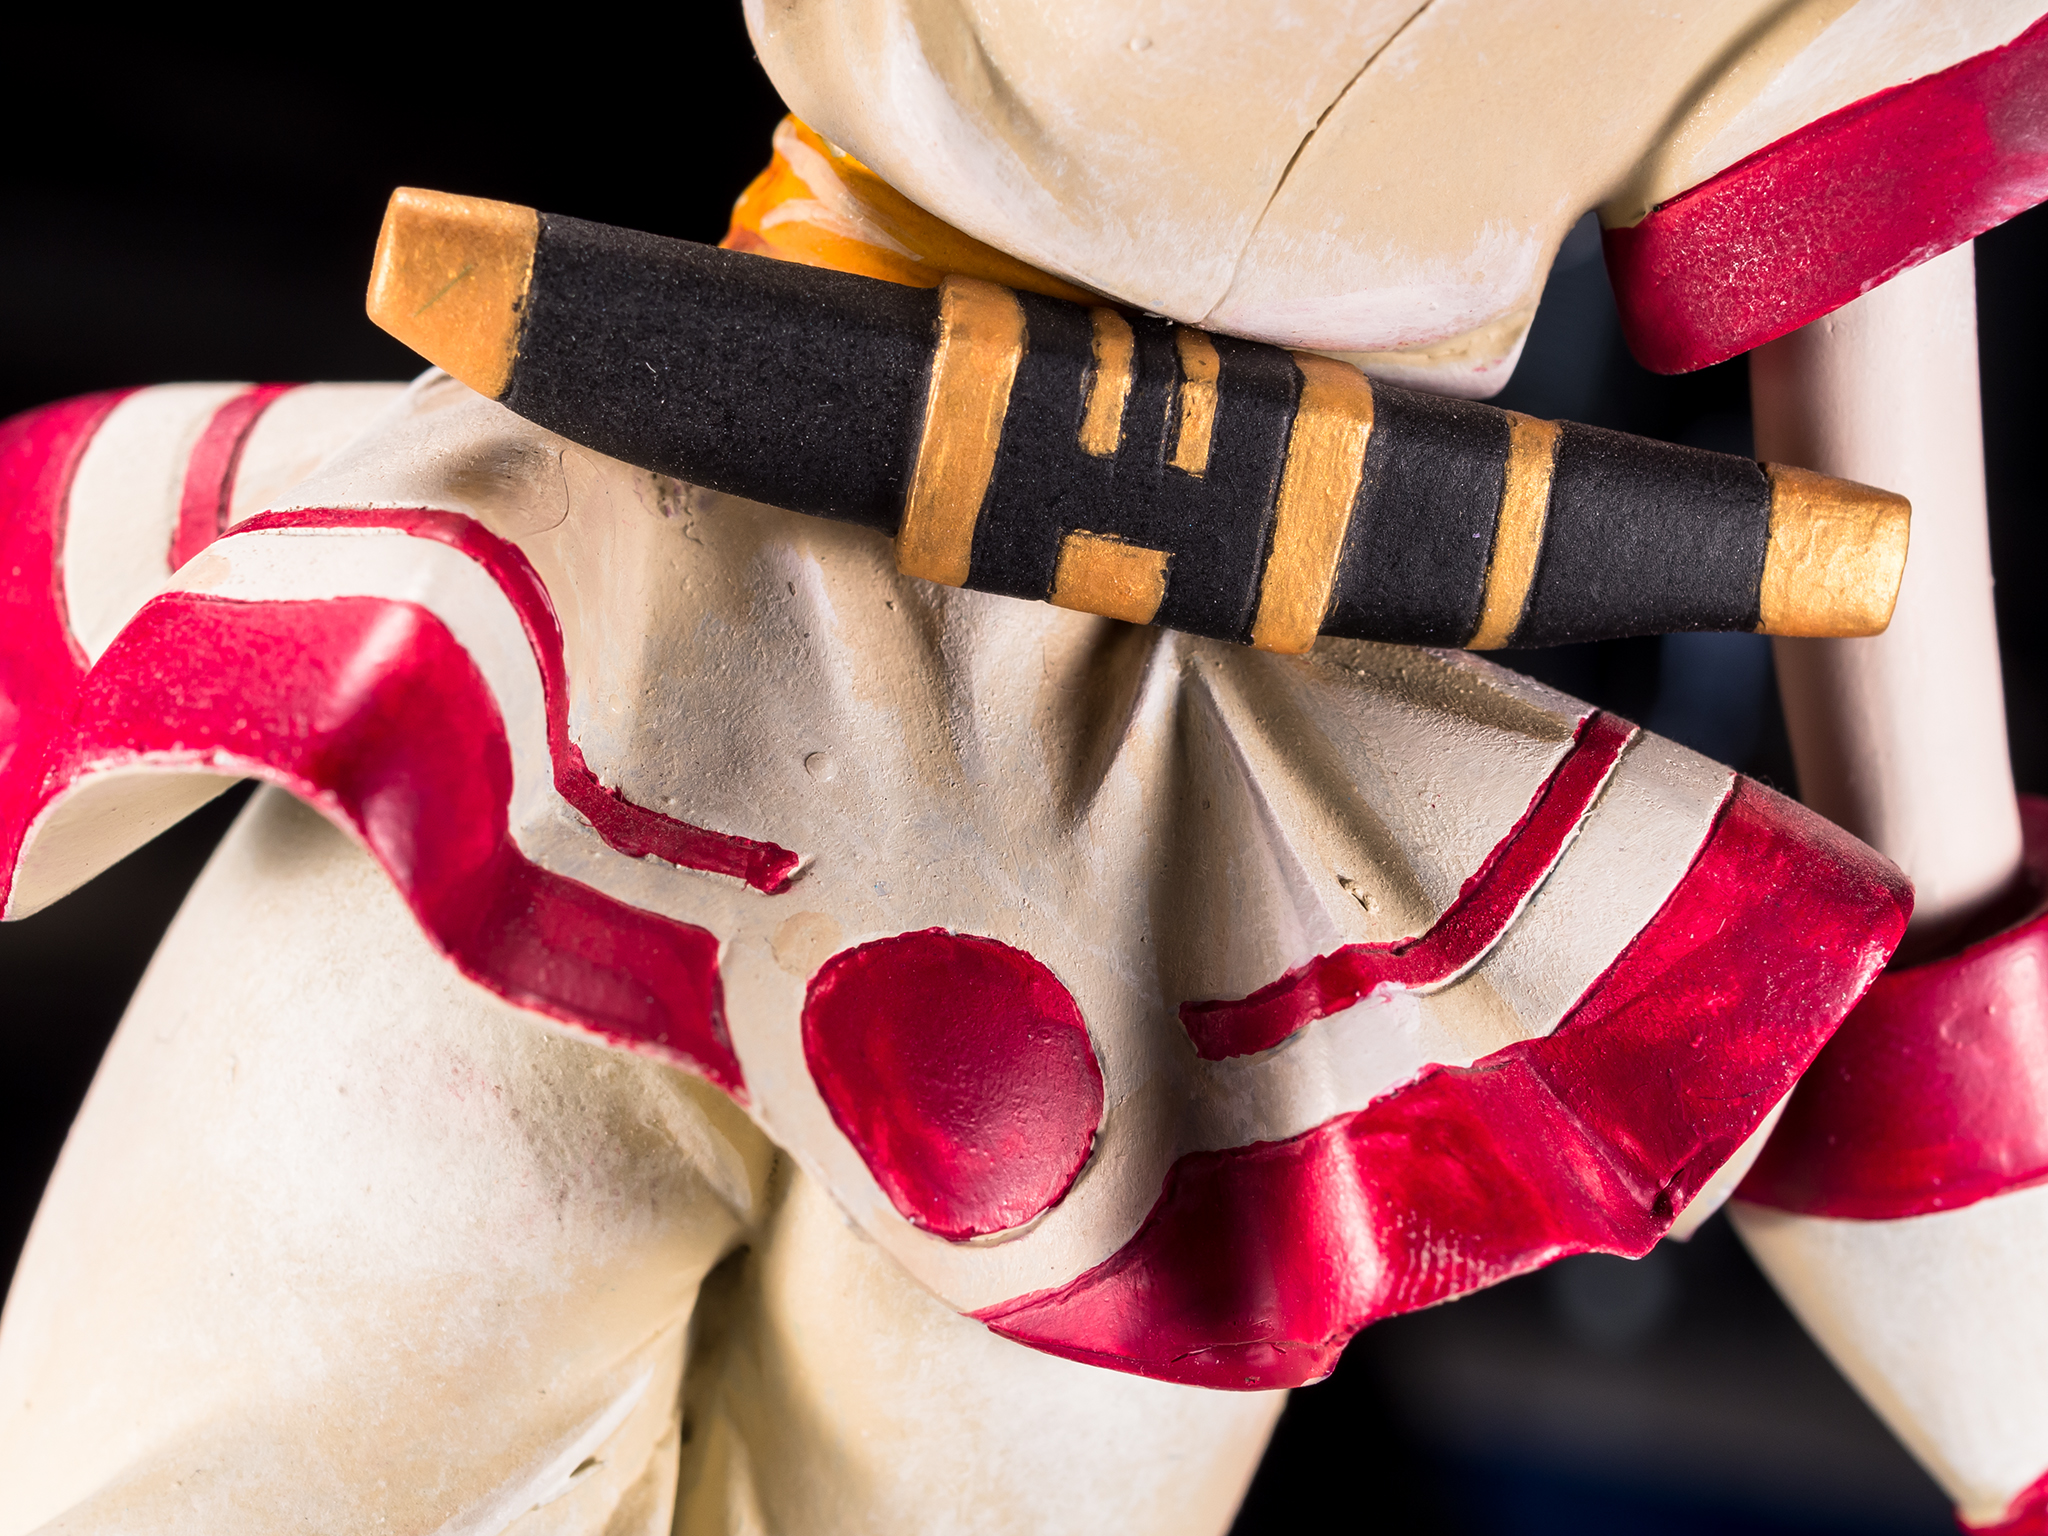 nakoruru samurai_spirits t's_system